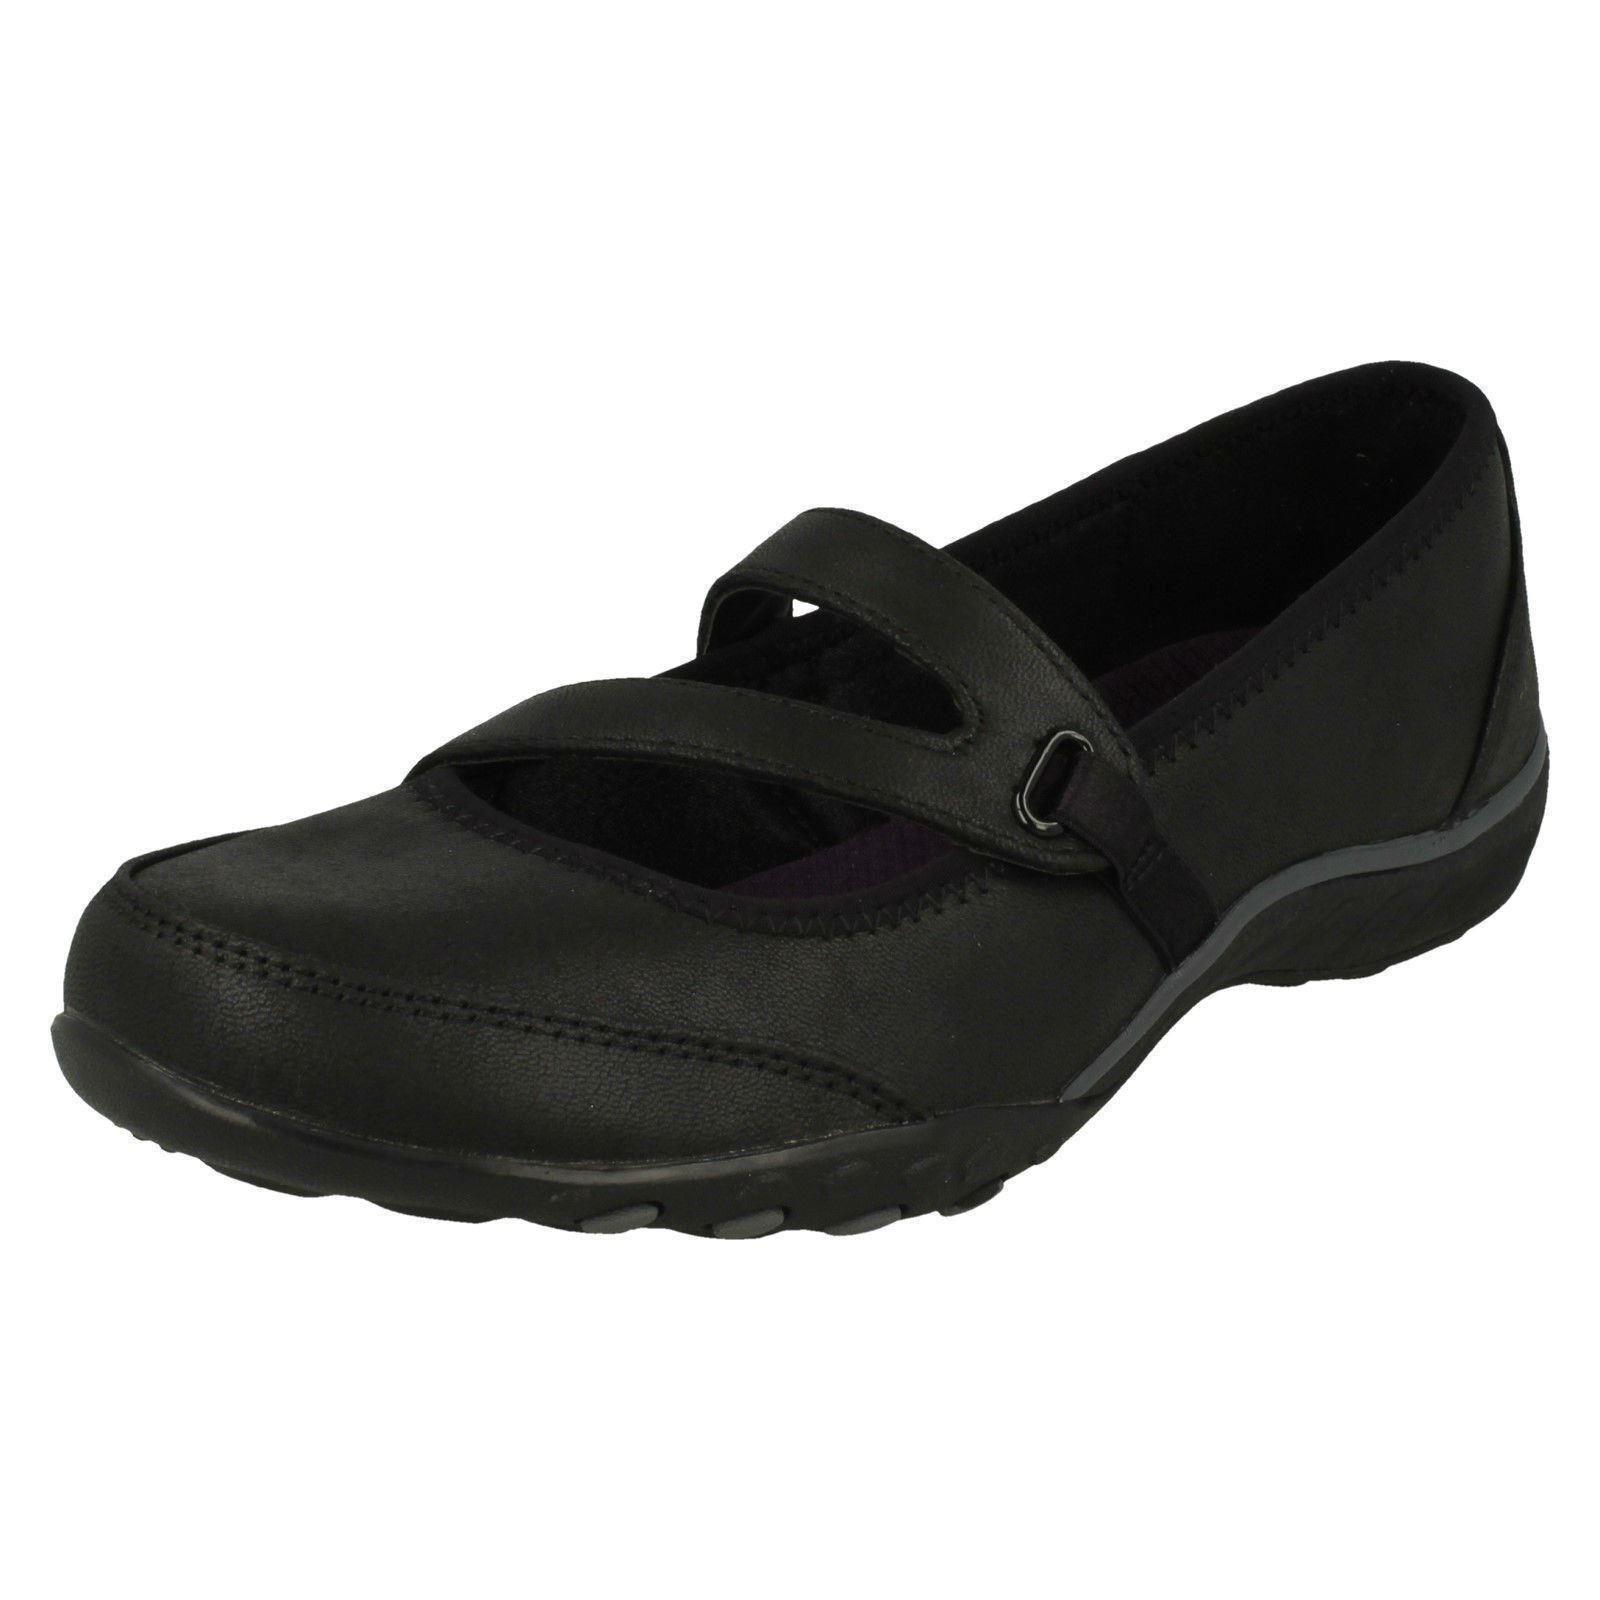 women Skechers Breathe Easy - Calmly shoes Nere Non Stringate